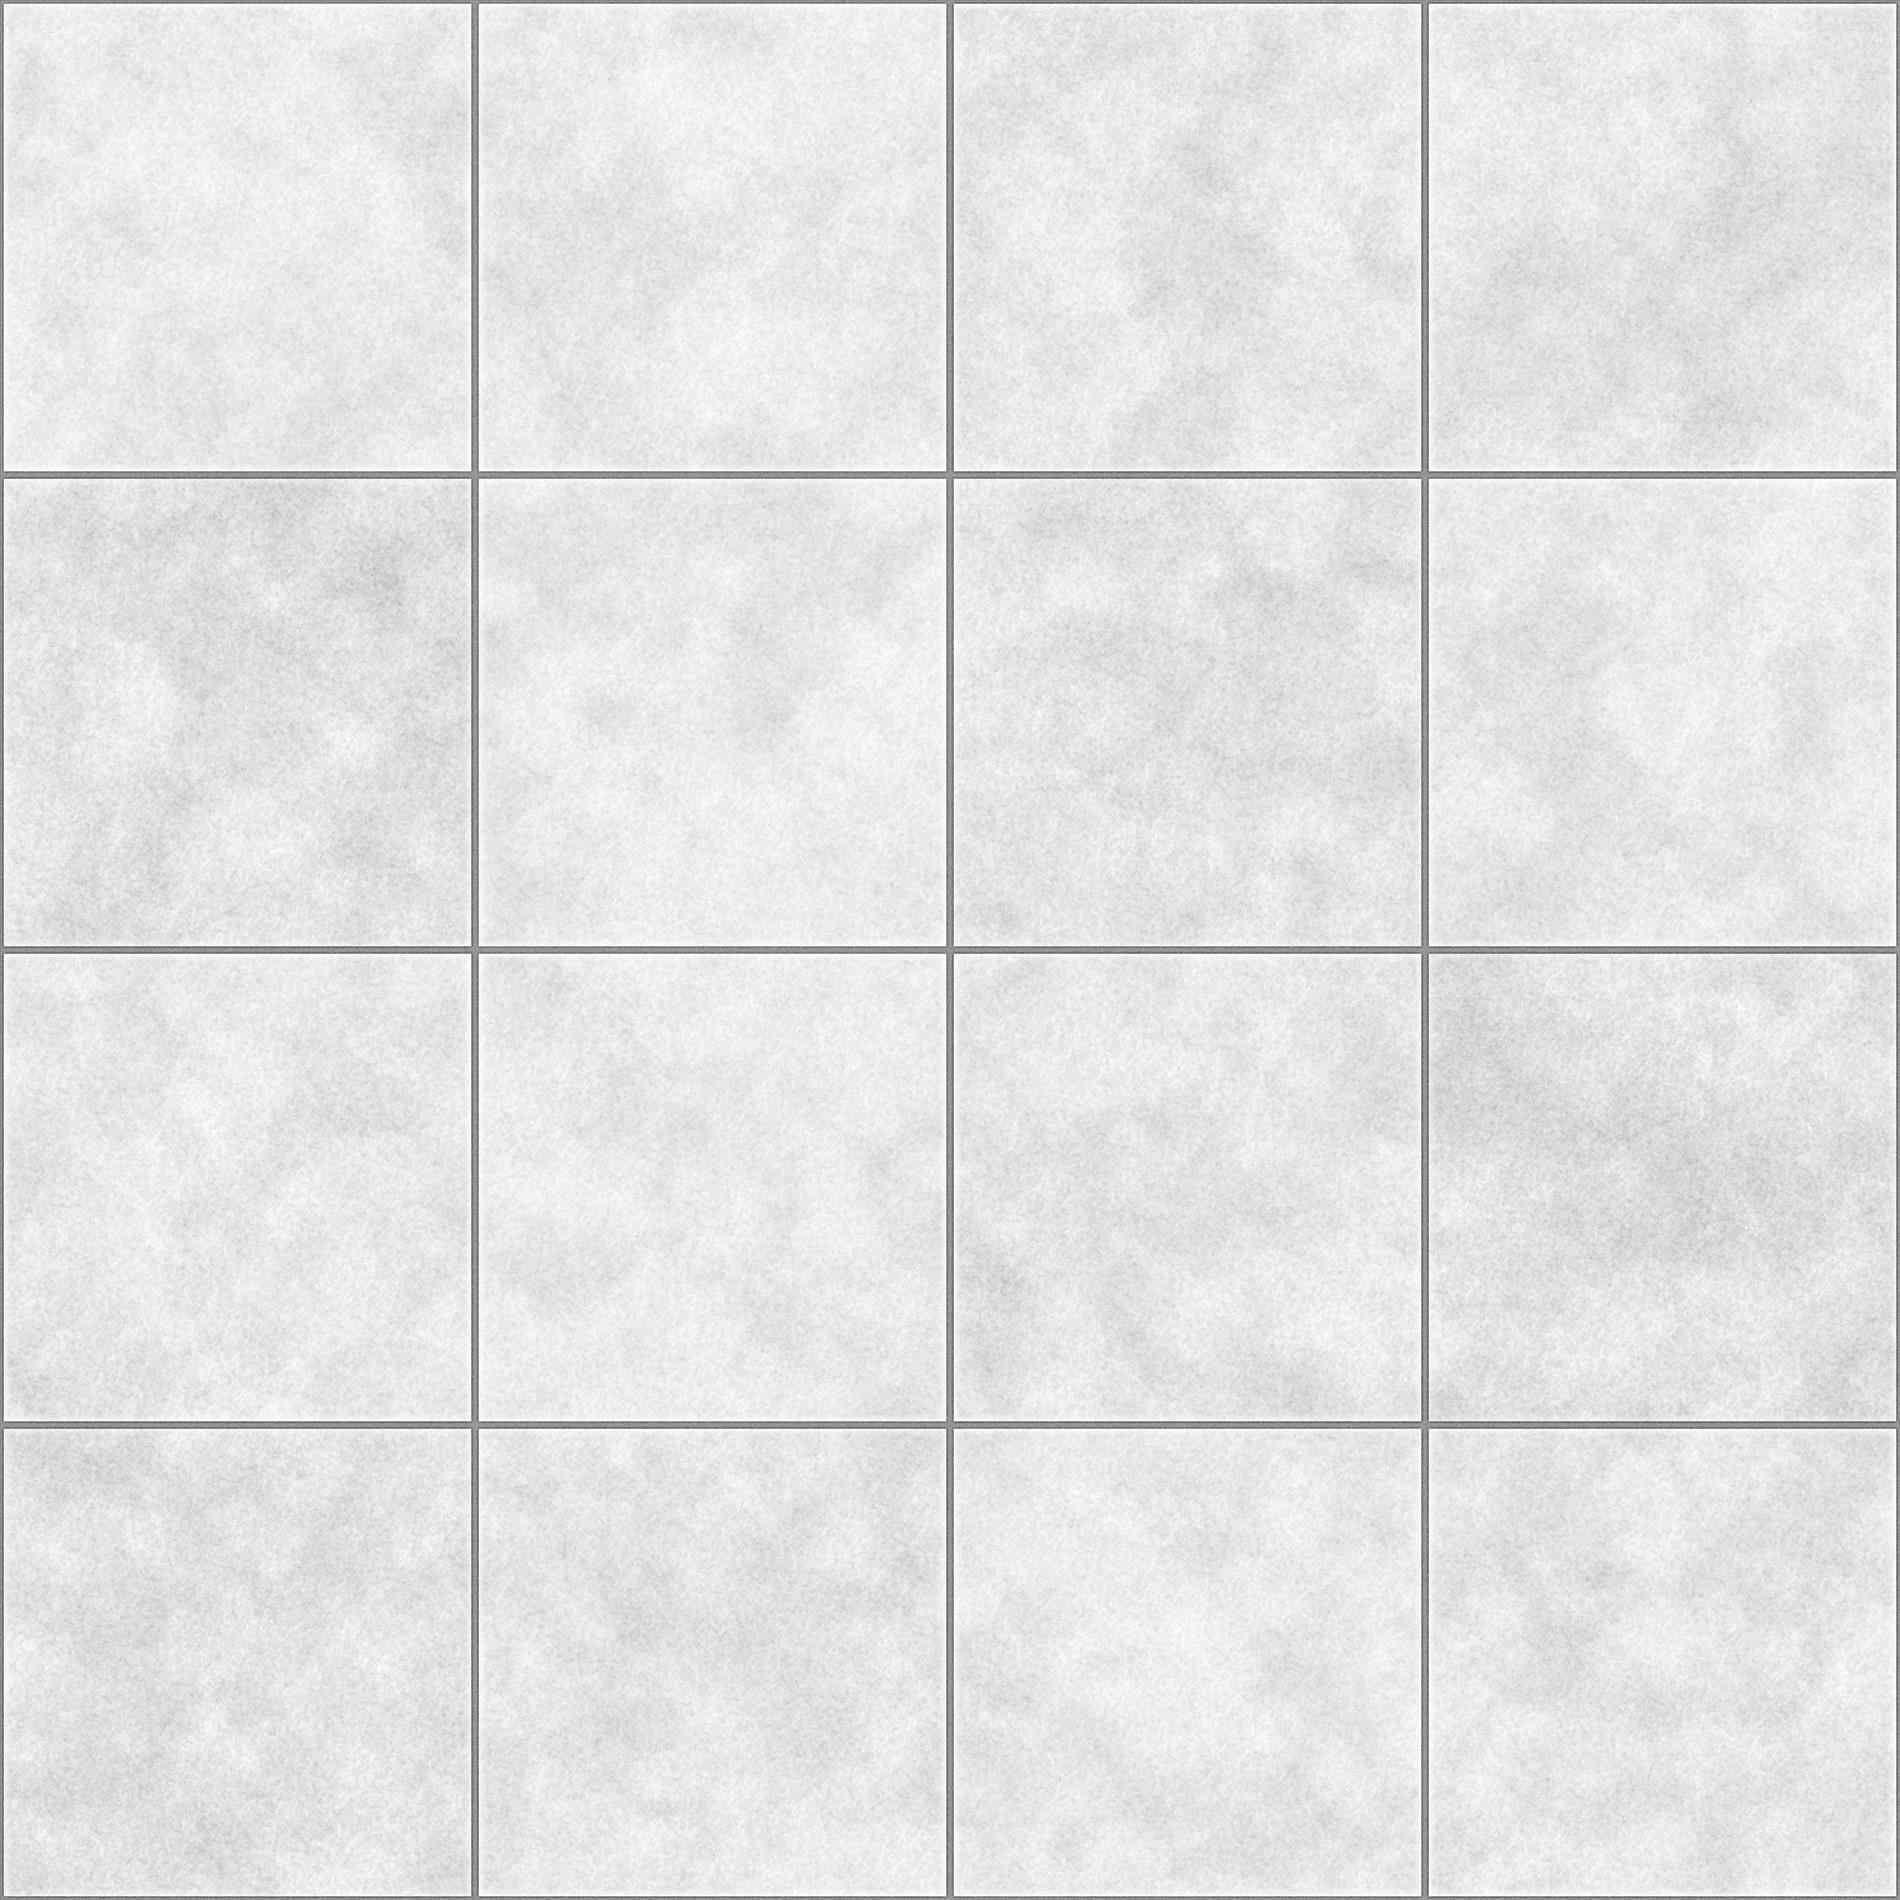 15 Wonderful Grey Bathroom Floor Tiles Texture for Your Home | Sci ...